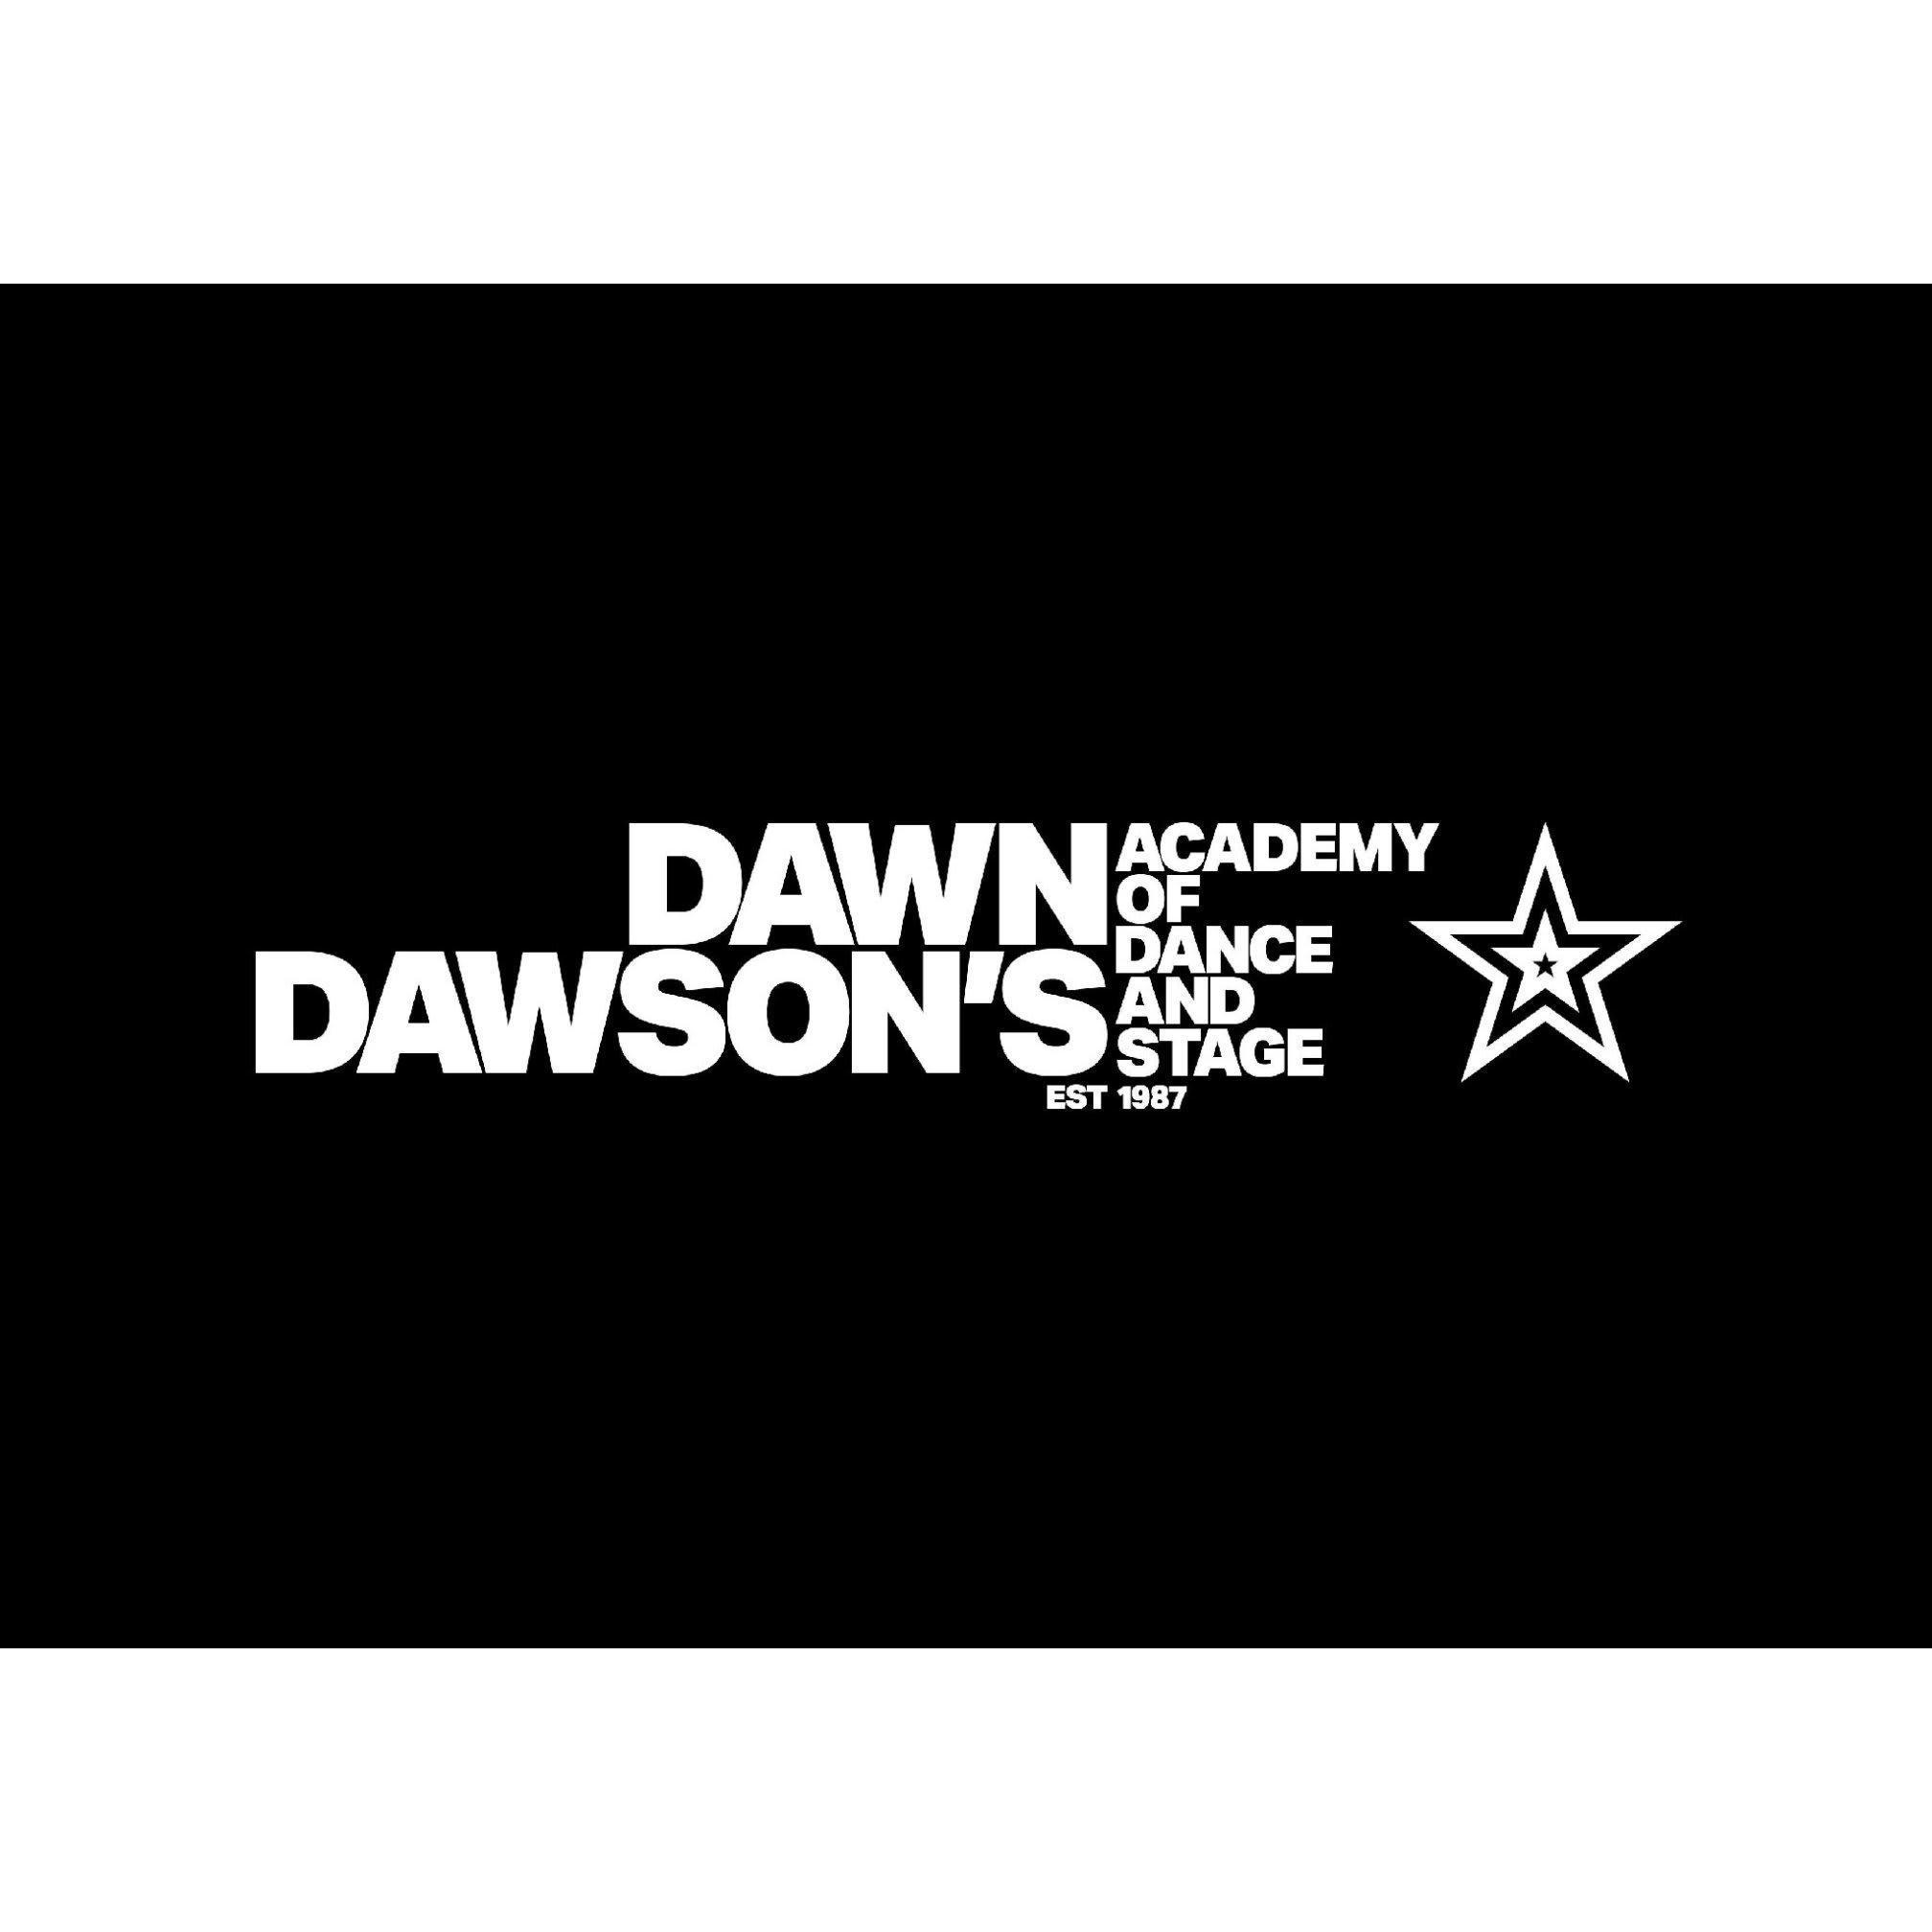 Dawson's Academy of Dance & Stage